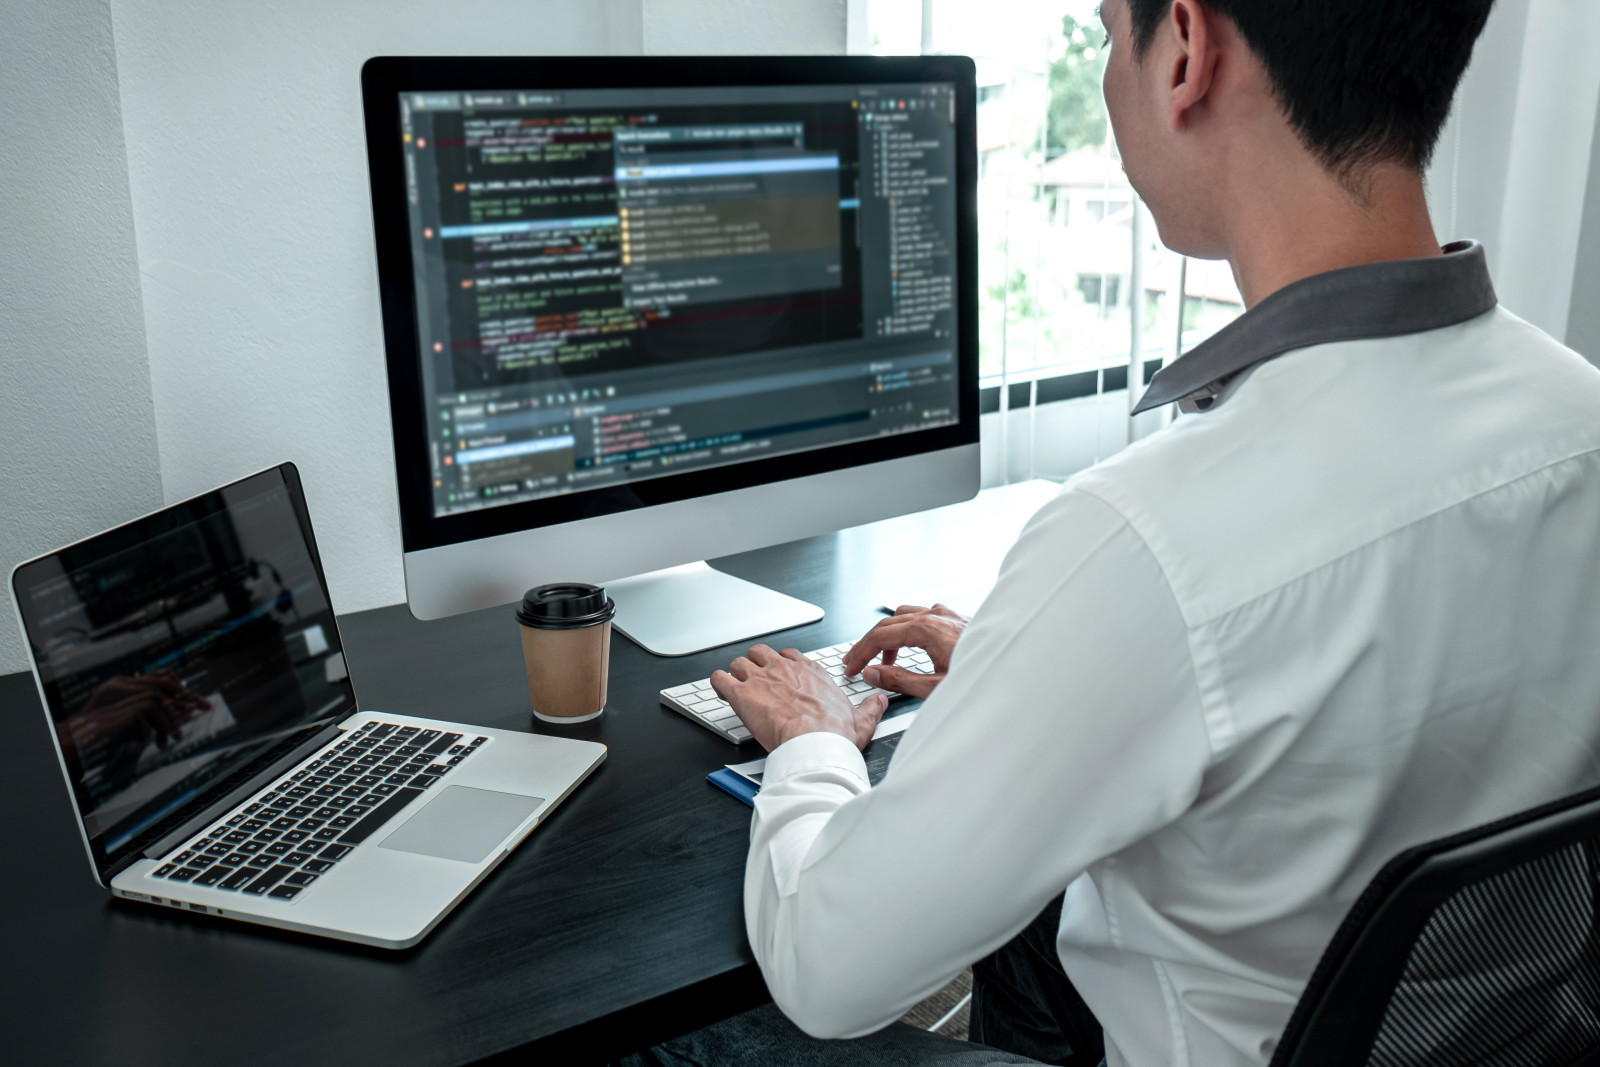 Regenerating Website Management Along with Digital Marketing Services